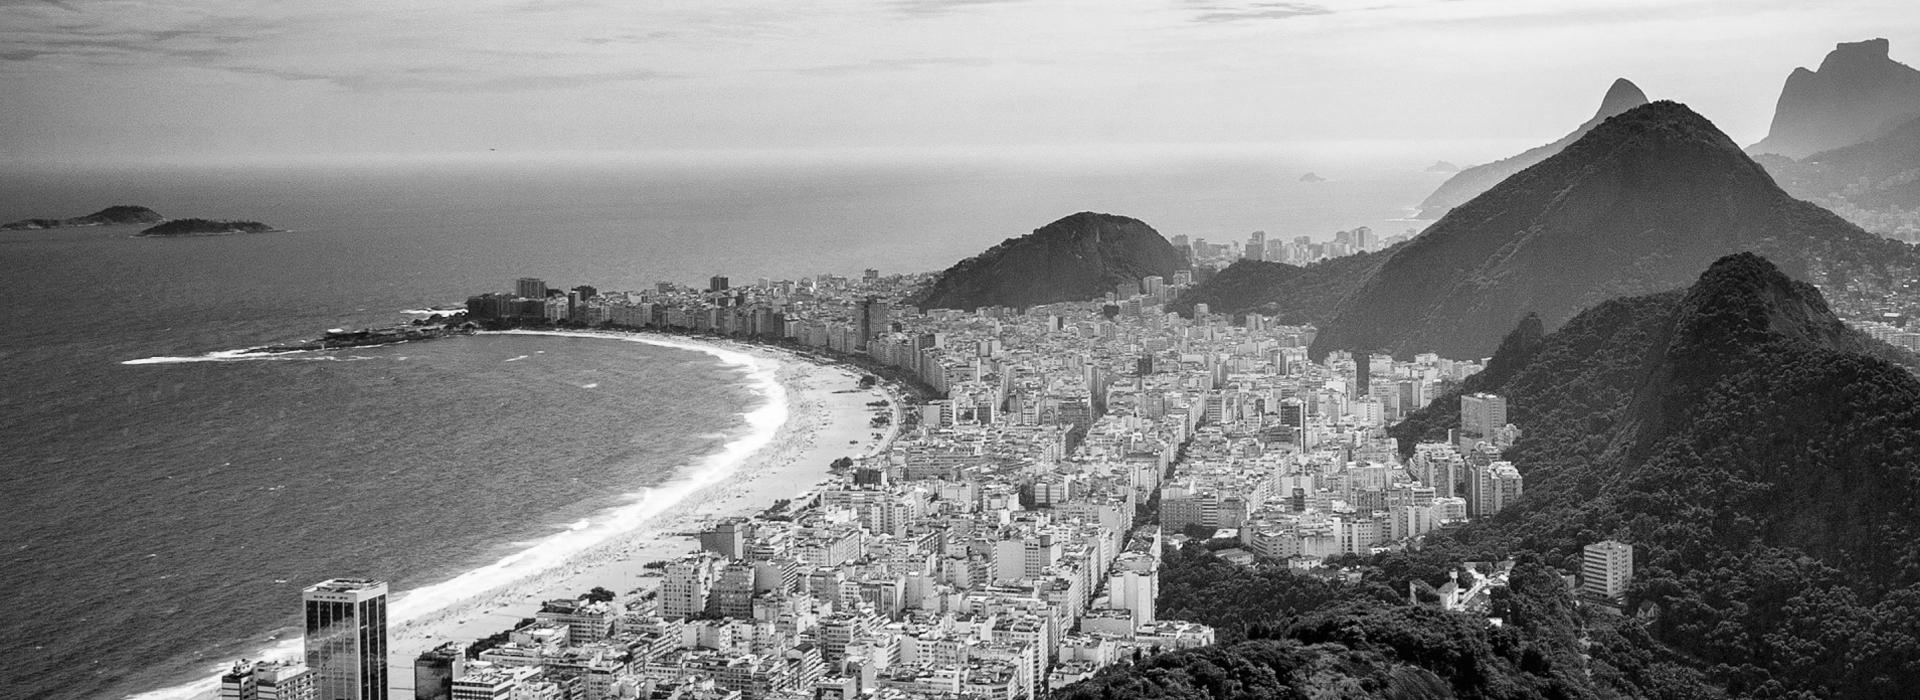 DECOUVREZ RIO DE JANEIRO